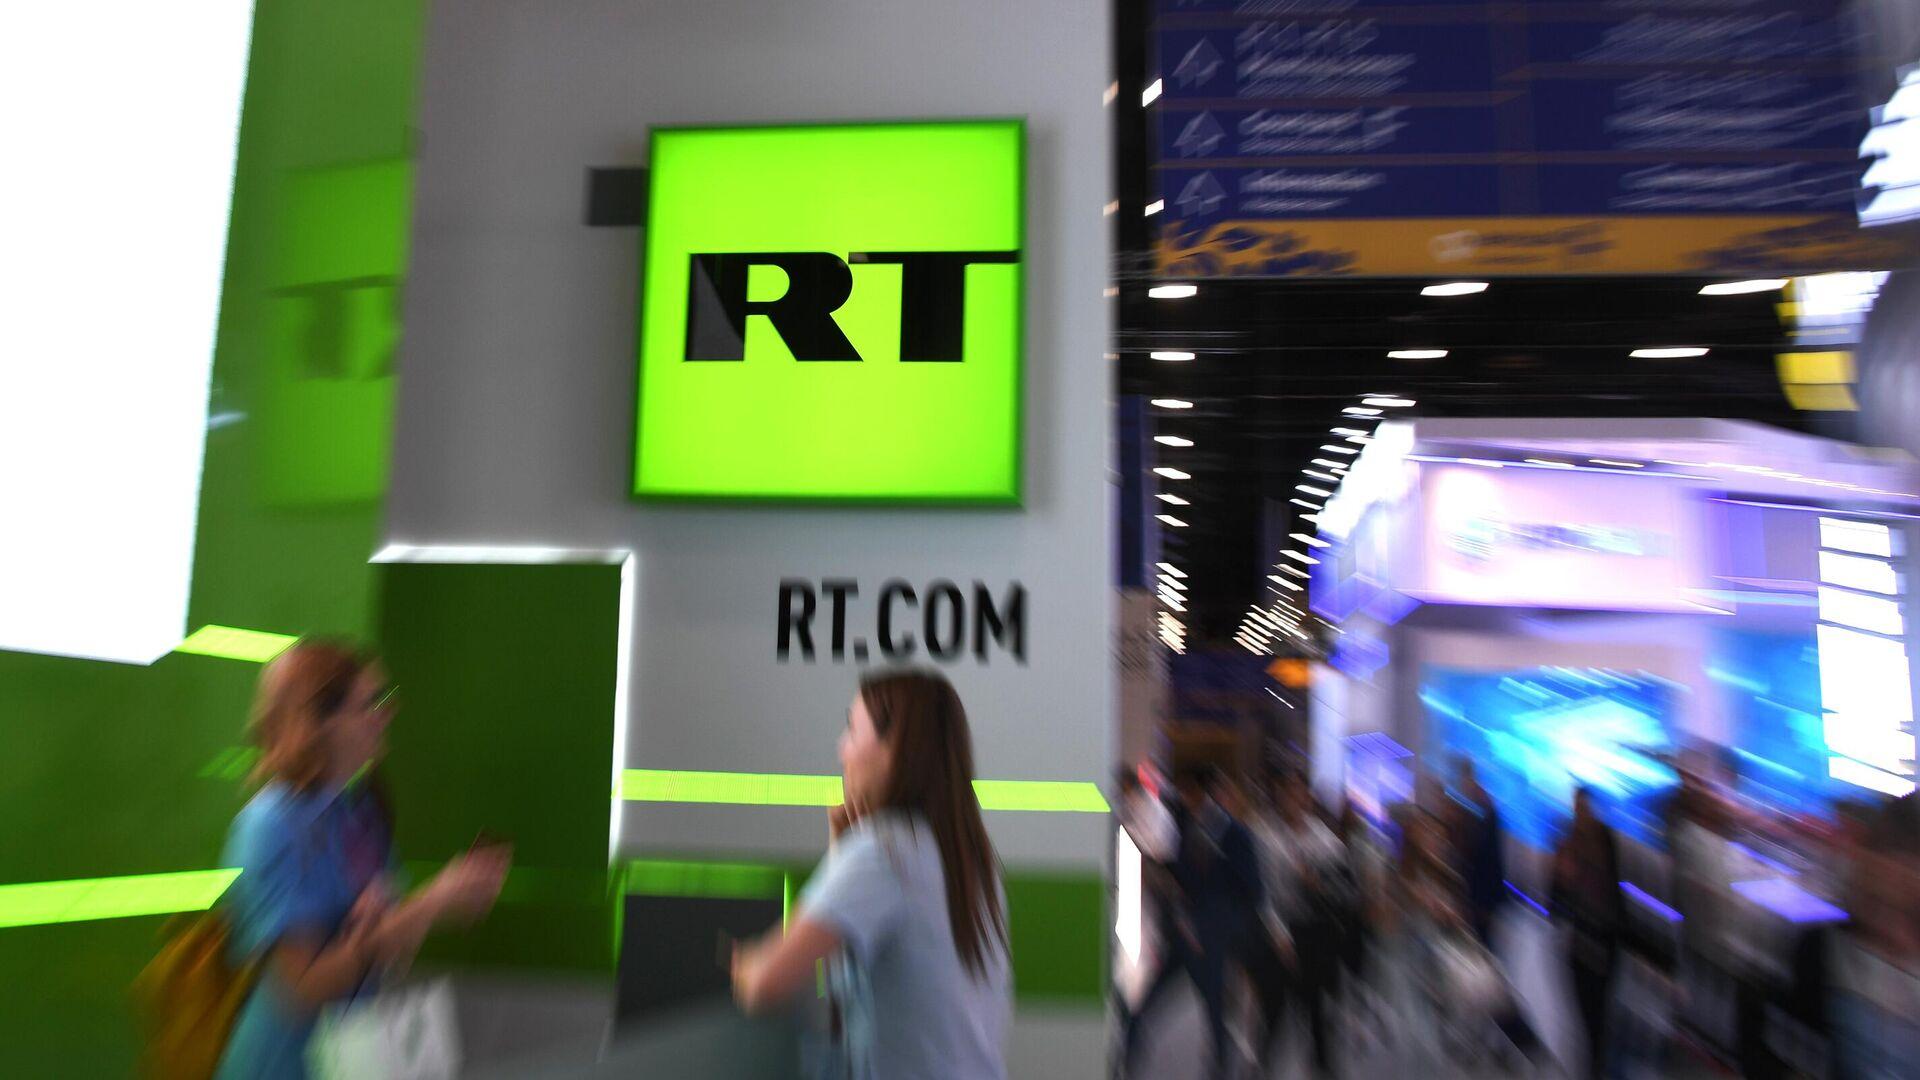 Логотип телеканала RT (Russia Today) - Sputnik Латвия, 1920, 13.10.2021